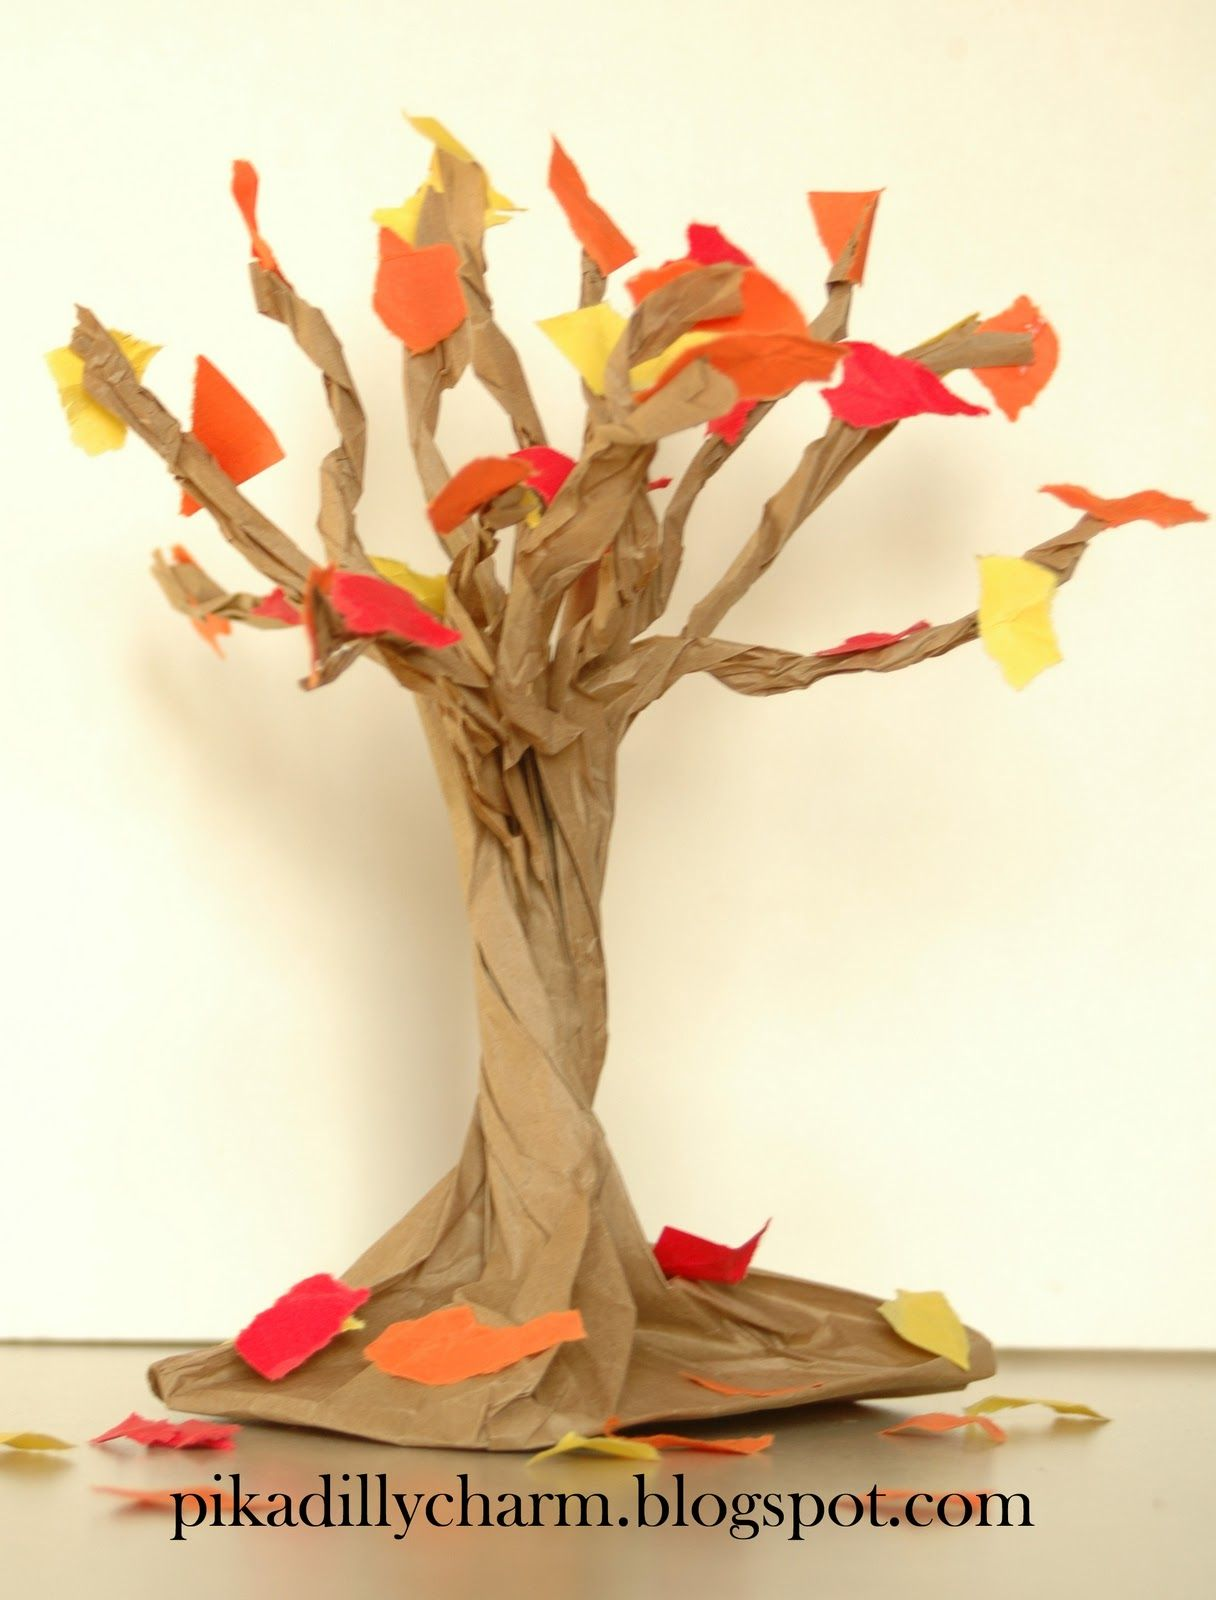 papier t ten baum basteln herbst pikadilly charm paper bag fall tree september pinterest. Black Bedroom Furniture Sets. Home Design Ideas